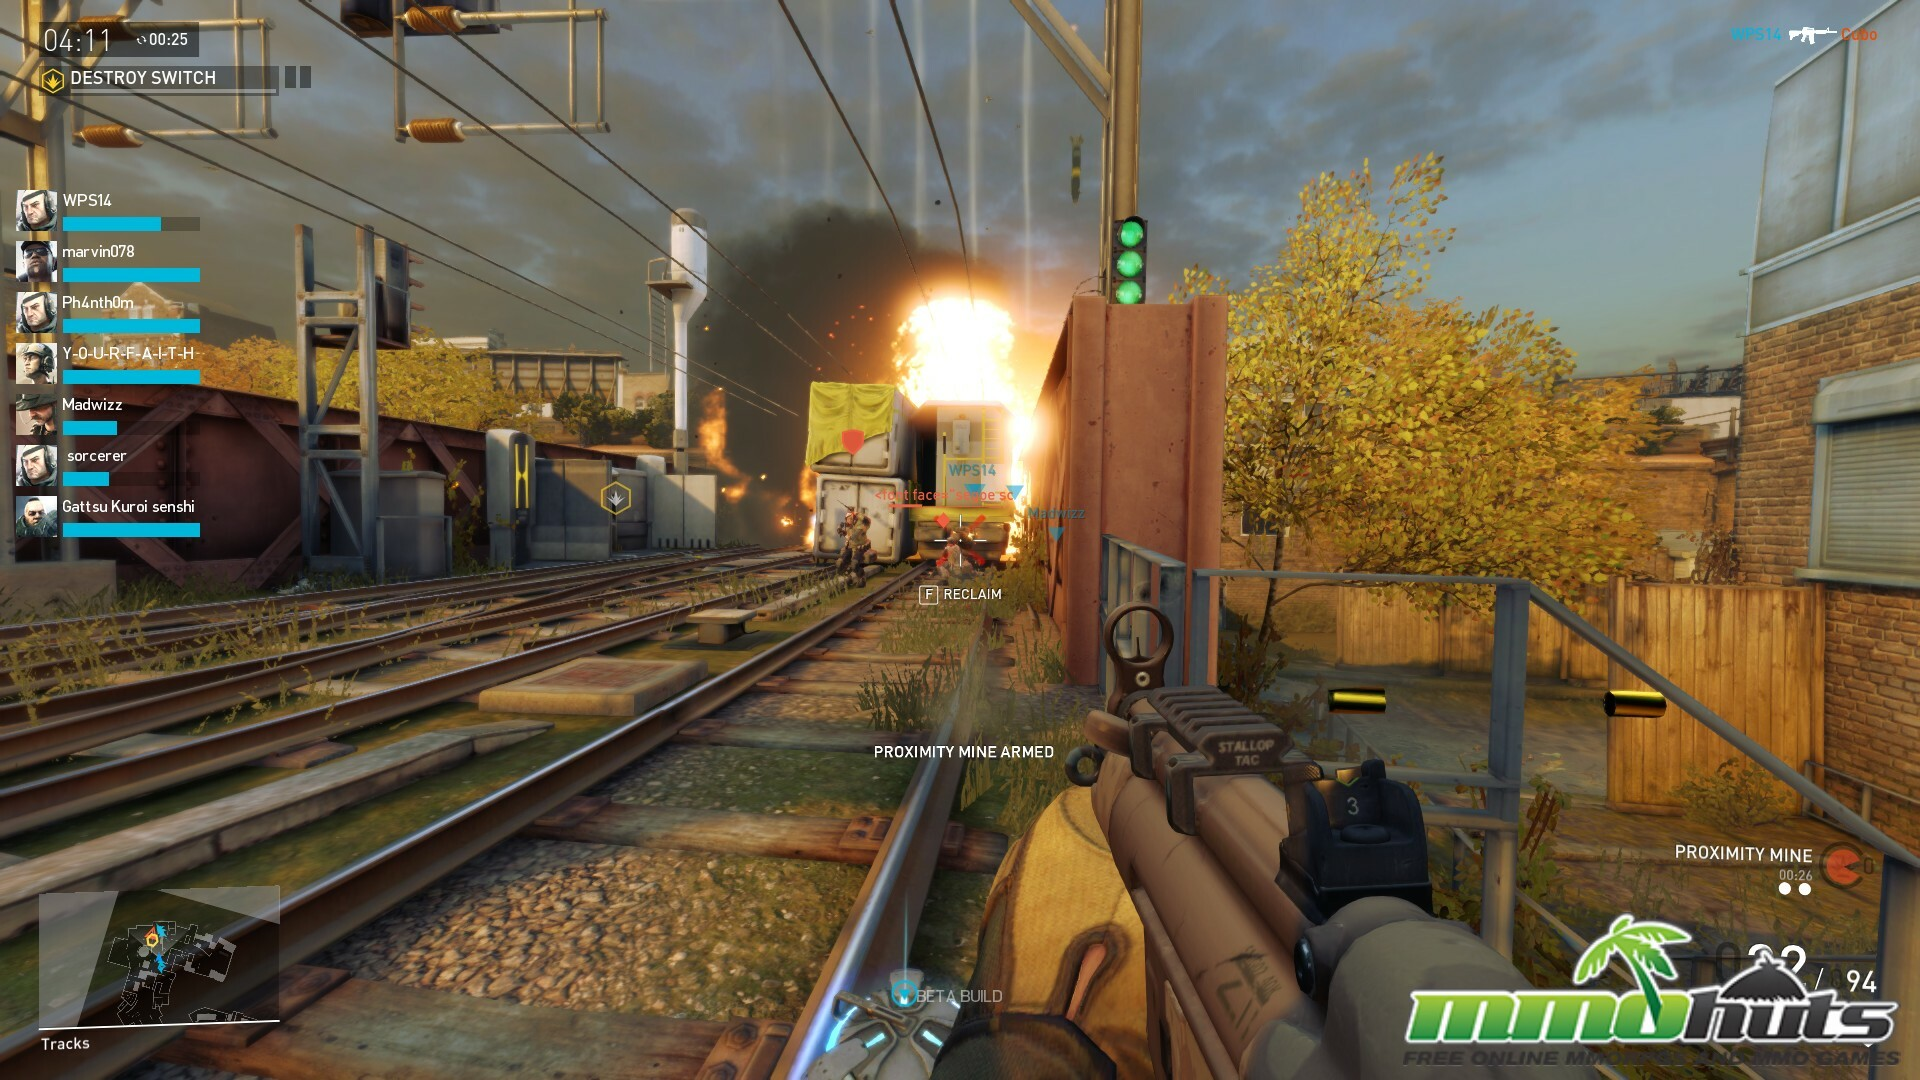 Dirty Bomb 2015 Beta Impressions